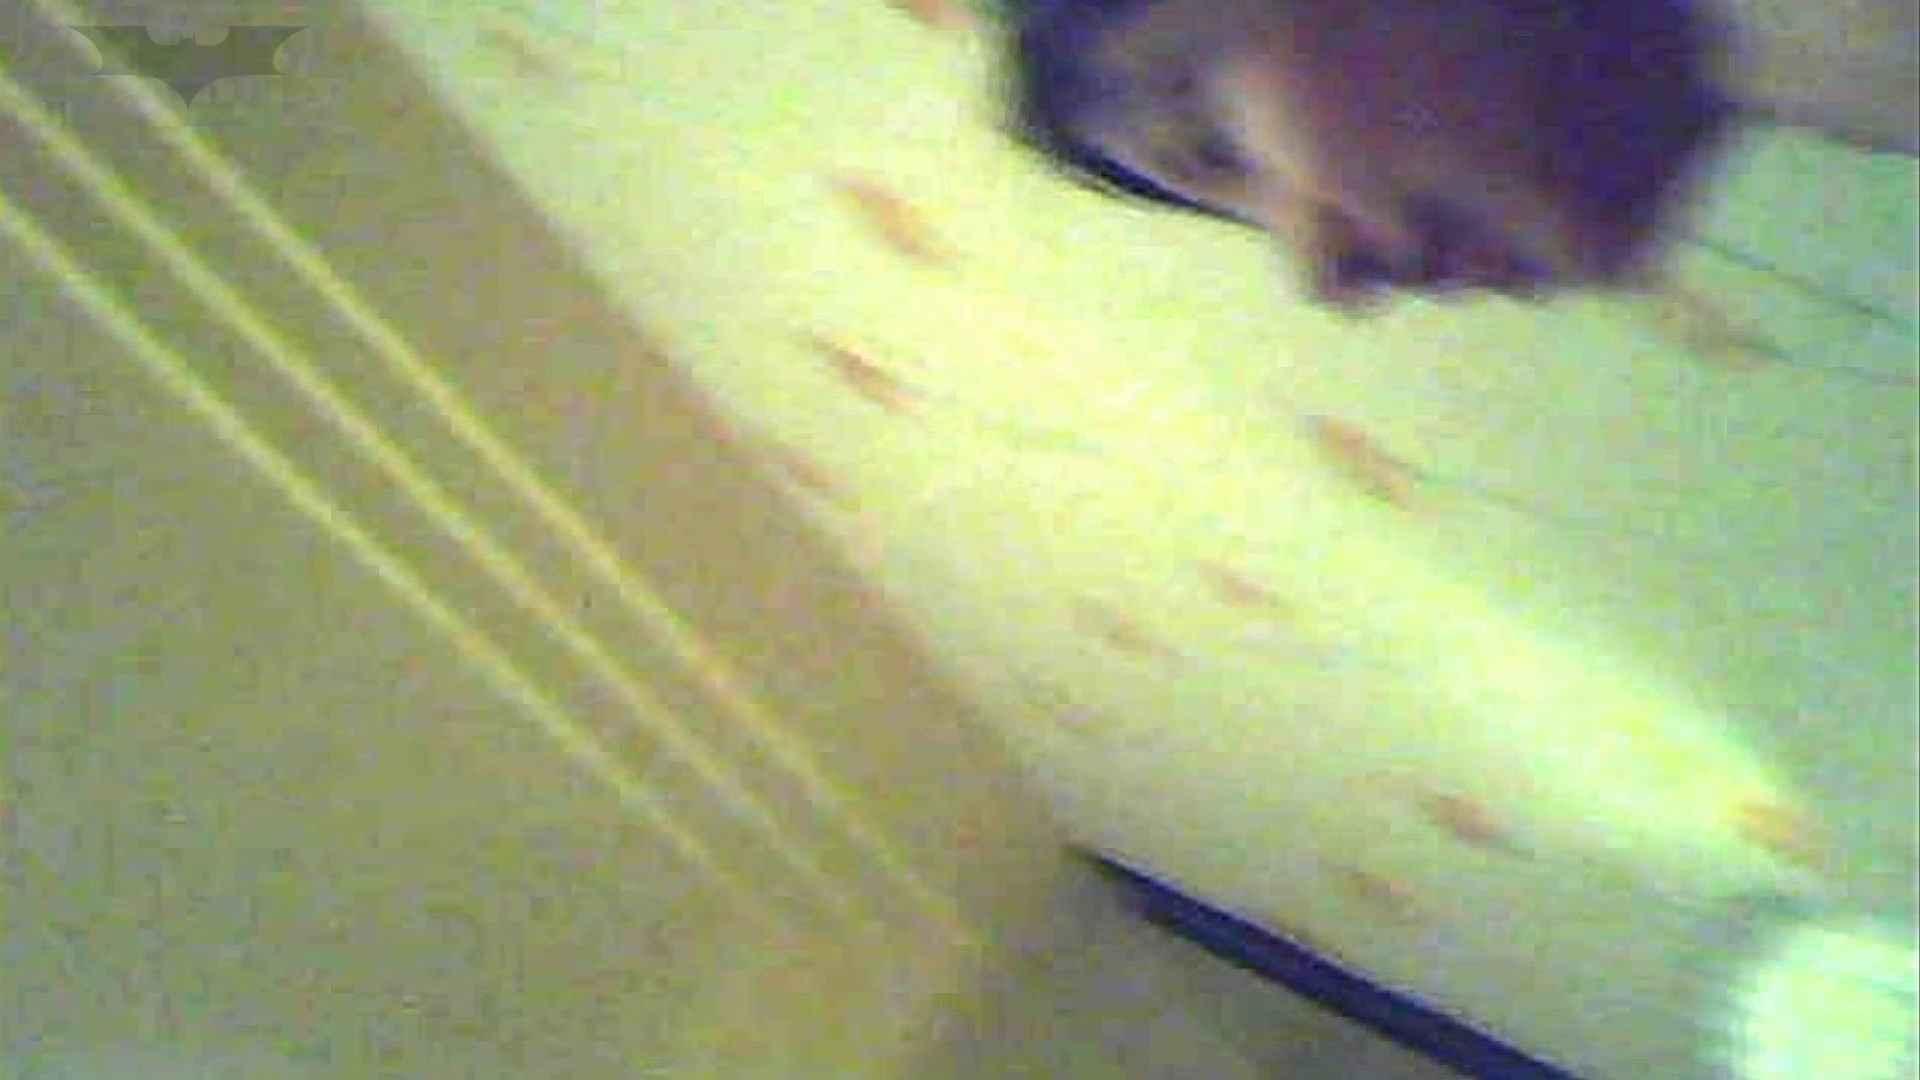 ▲2017_05位▲ 学園アイドル美人女子大生!❶4人厳選詰合せVol.49 人気作   女子大生  113画像 1